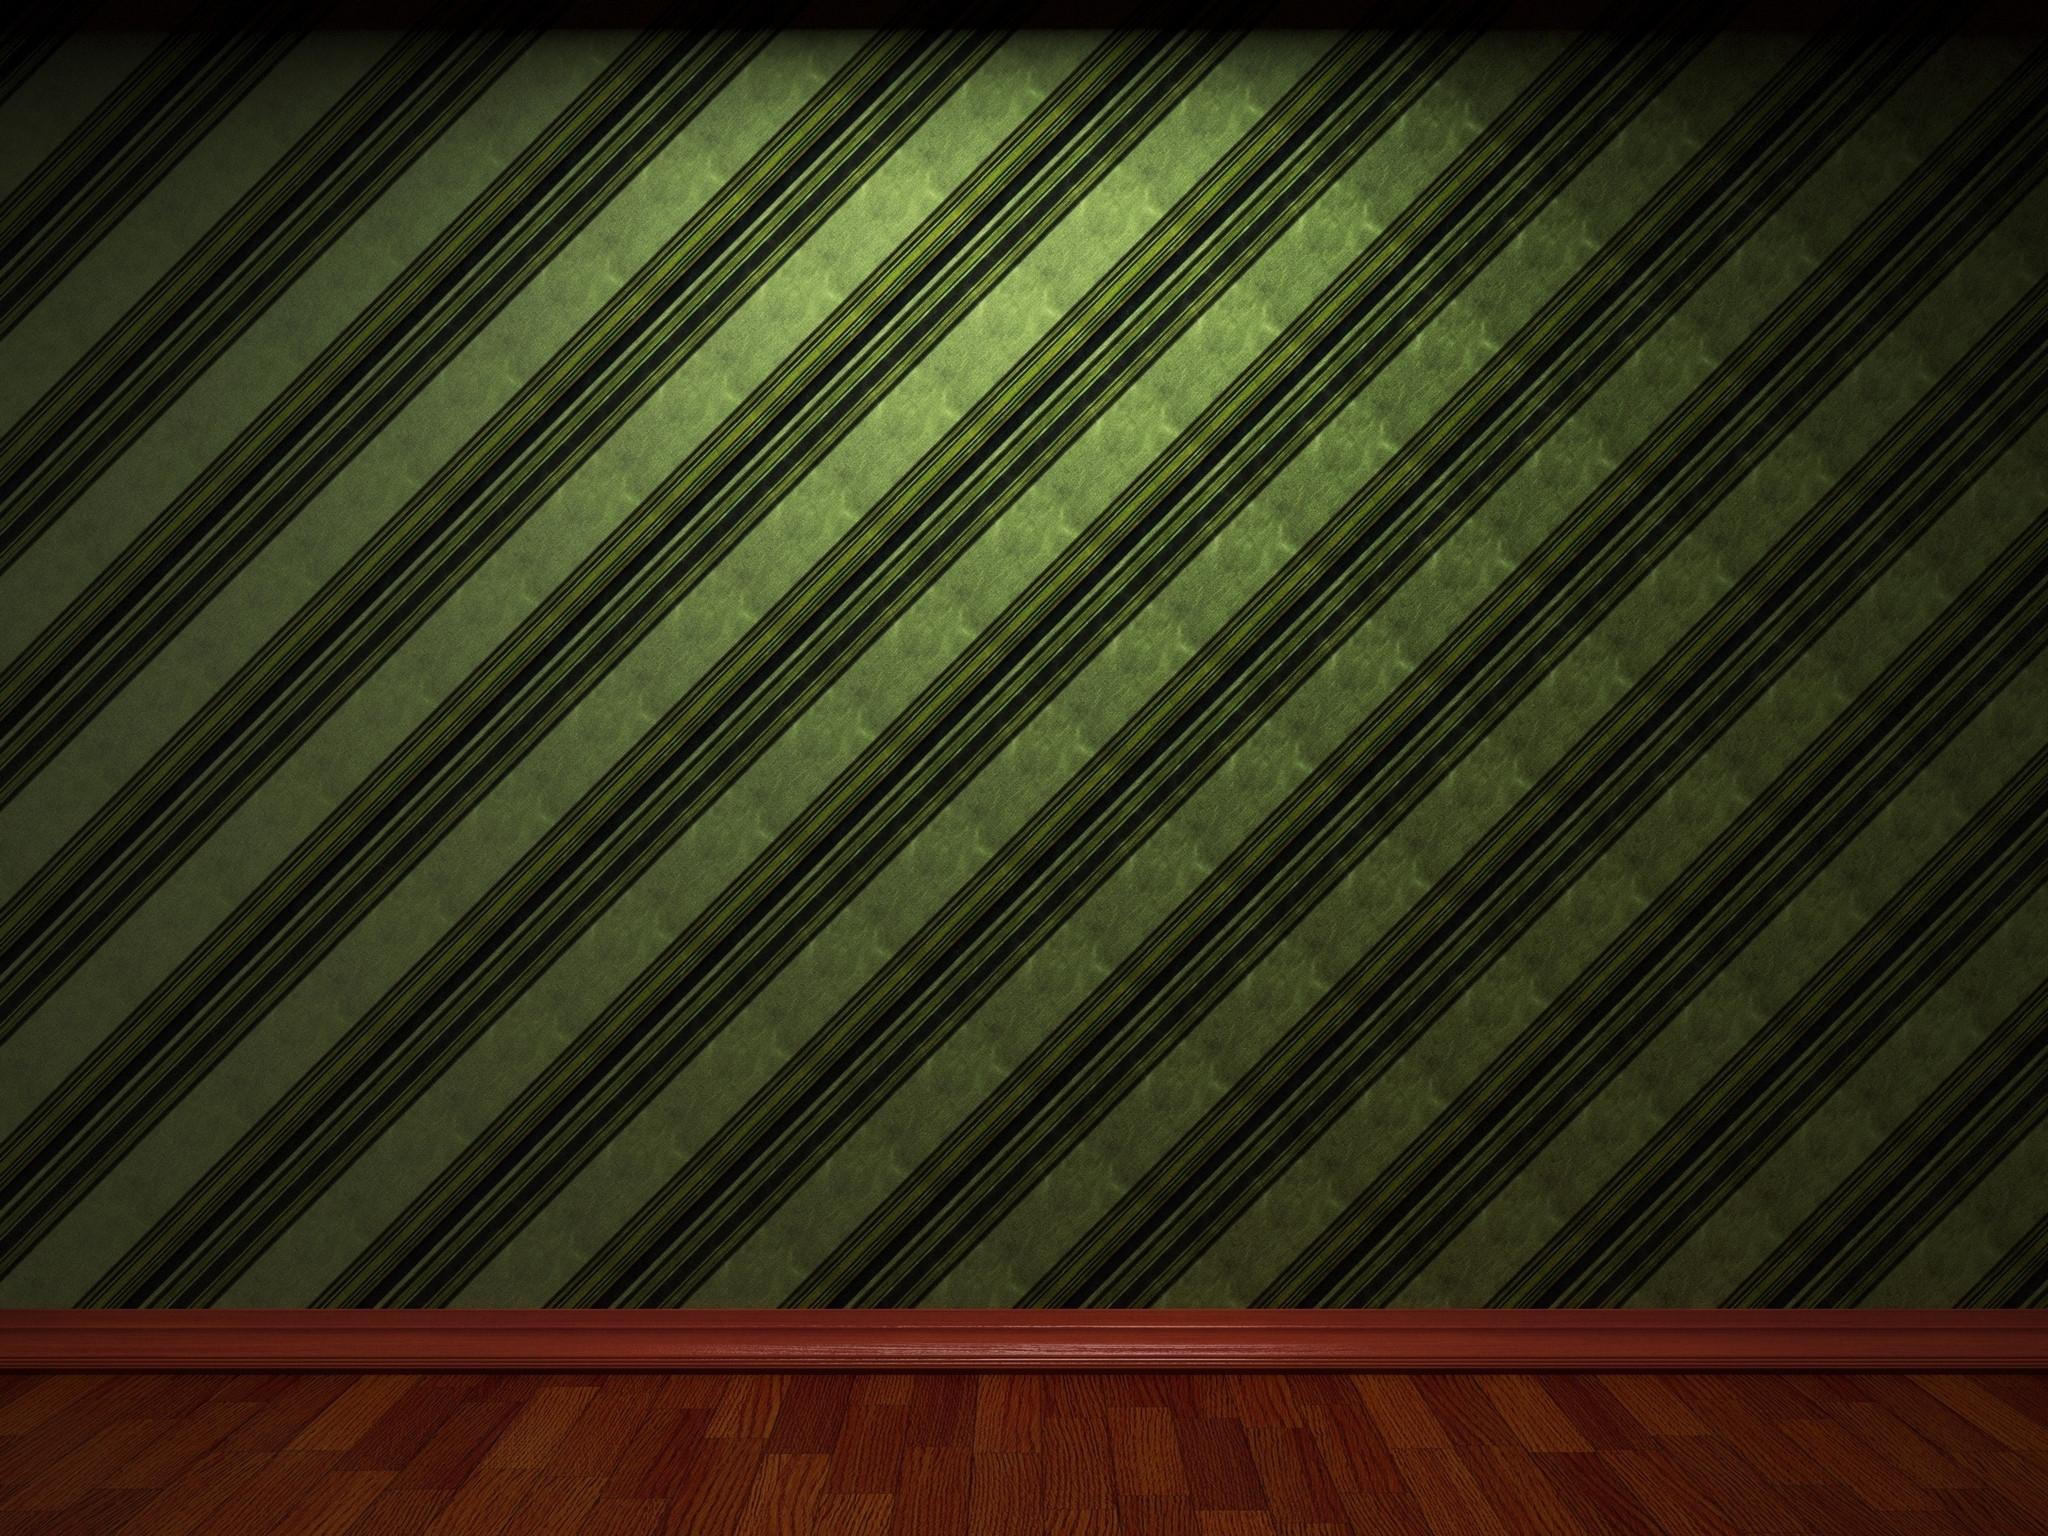 Elegant-wall-design-designs-22687131-204